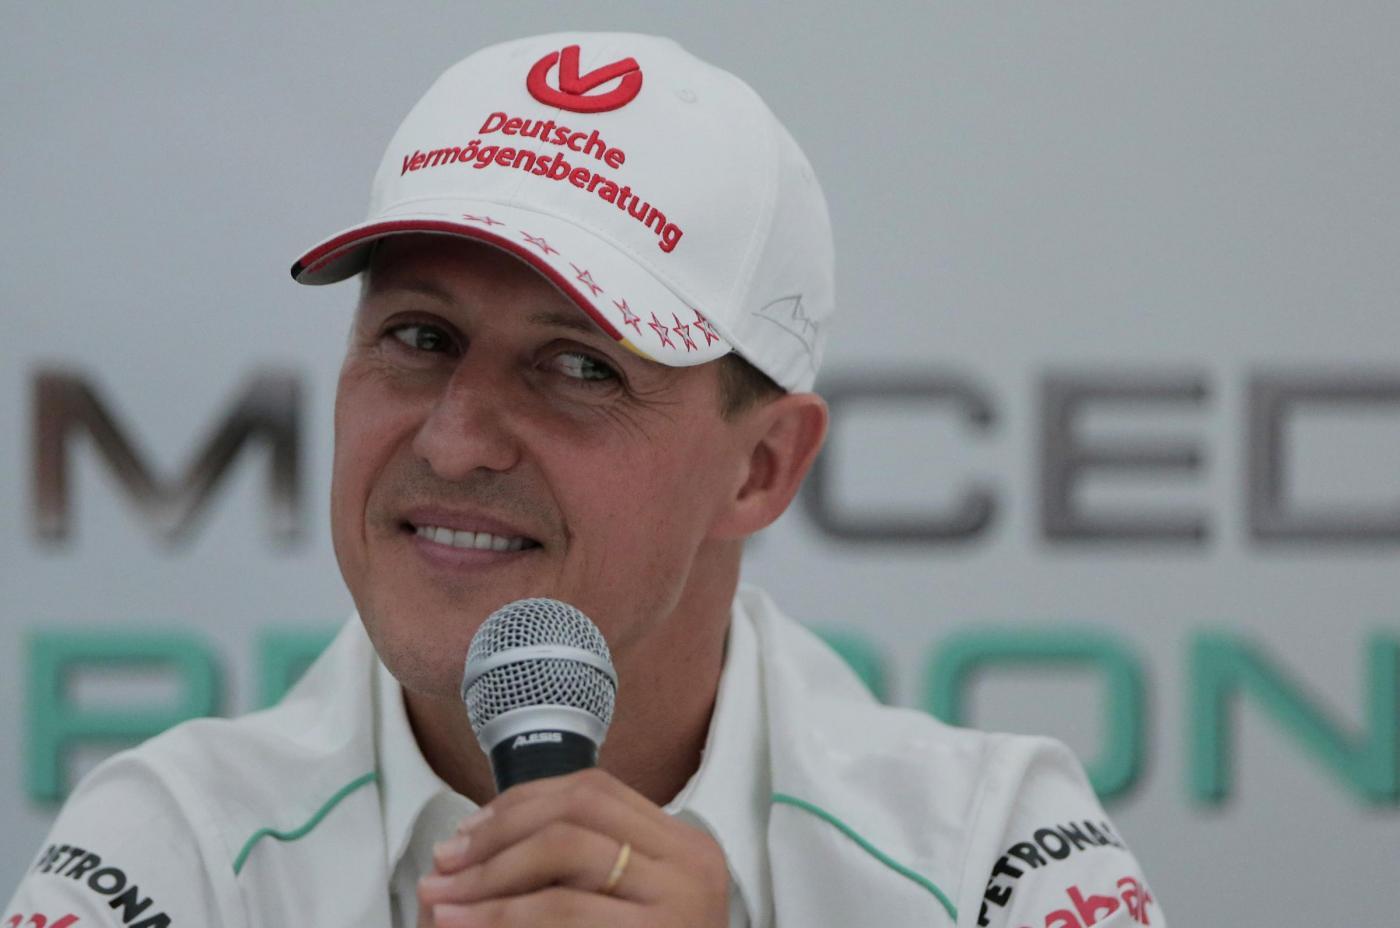 «Solo un miracolo salverà Michael Schumacher»